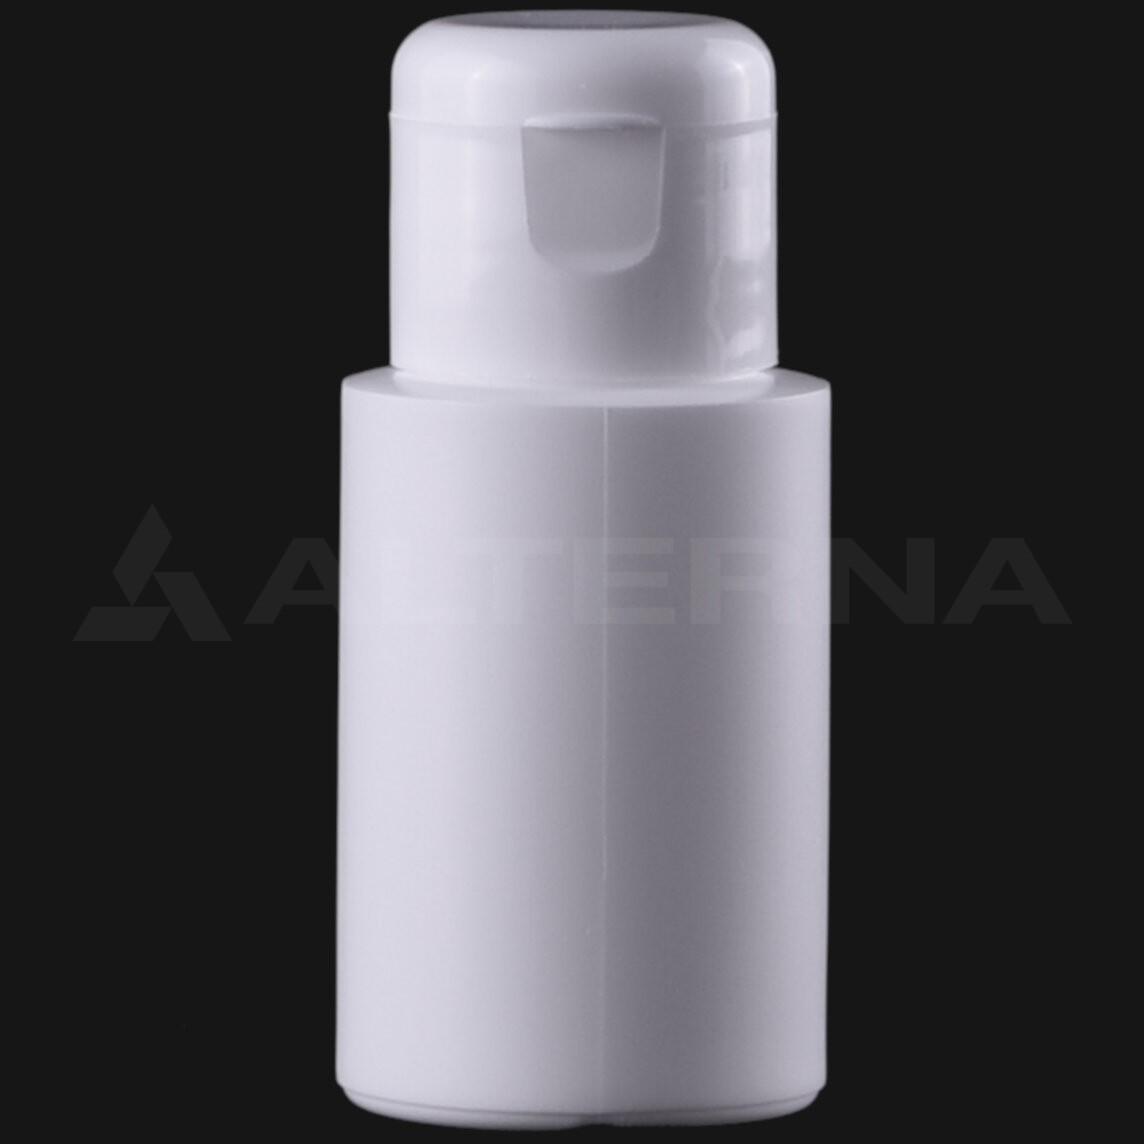 30 ml HDPE Bottle with 24 mm Flip Top Cap